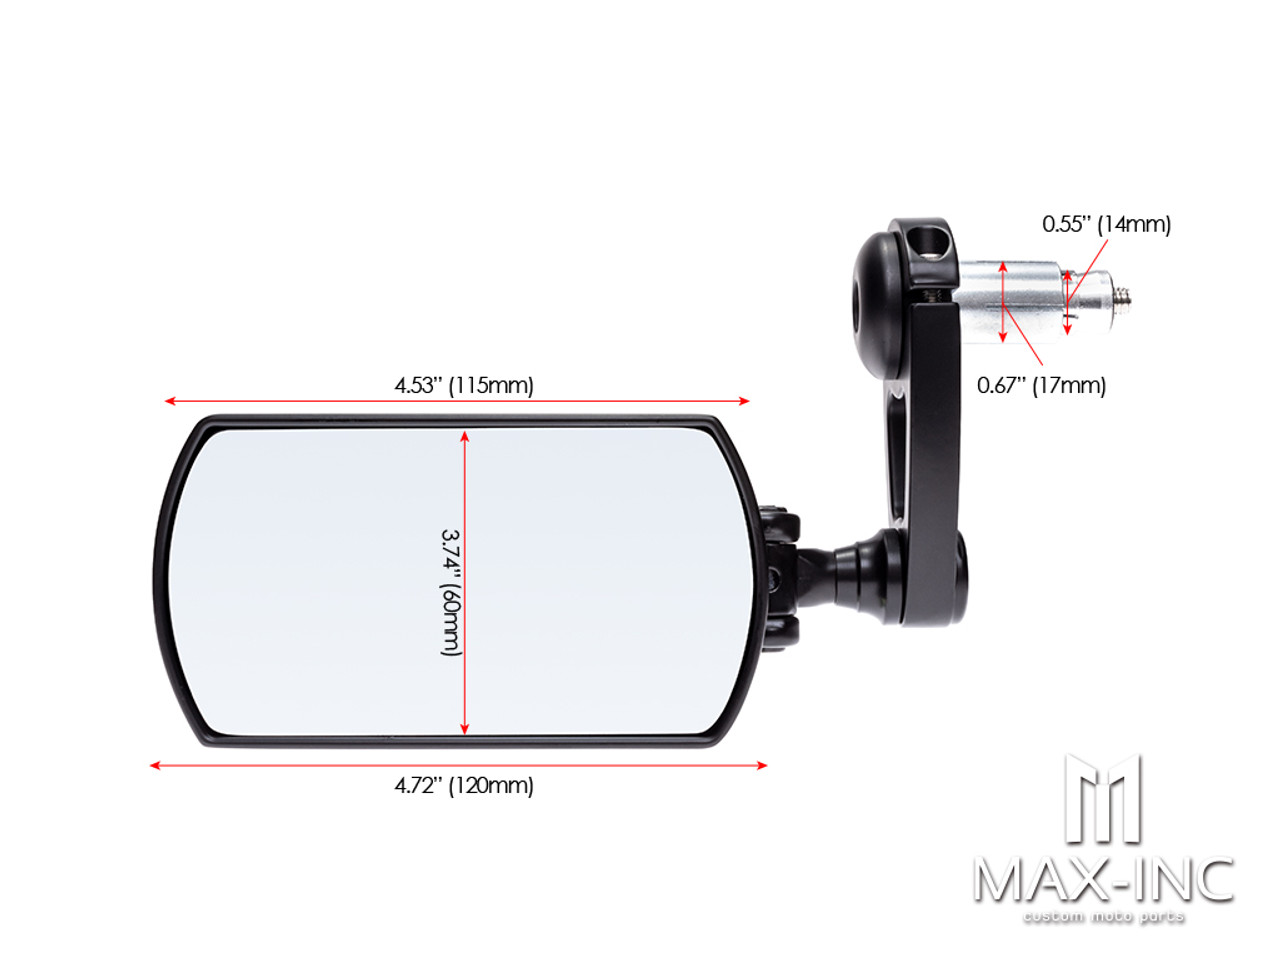 "Black Alloy Universal F1 Adjustable Bar End Mirrors - Fits 7/8""(22mm) Bars & Renthal Bars"